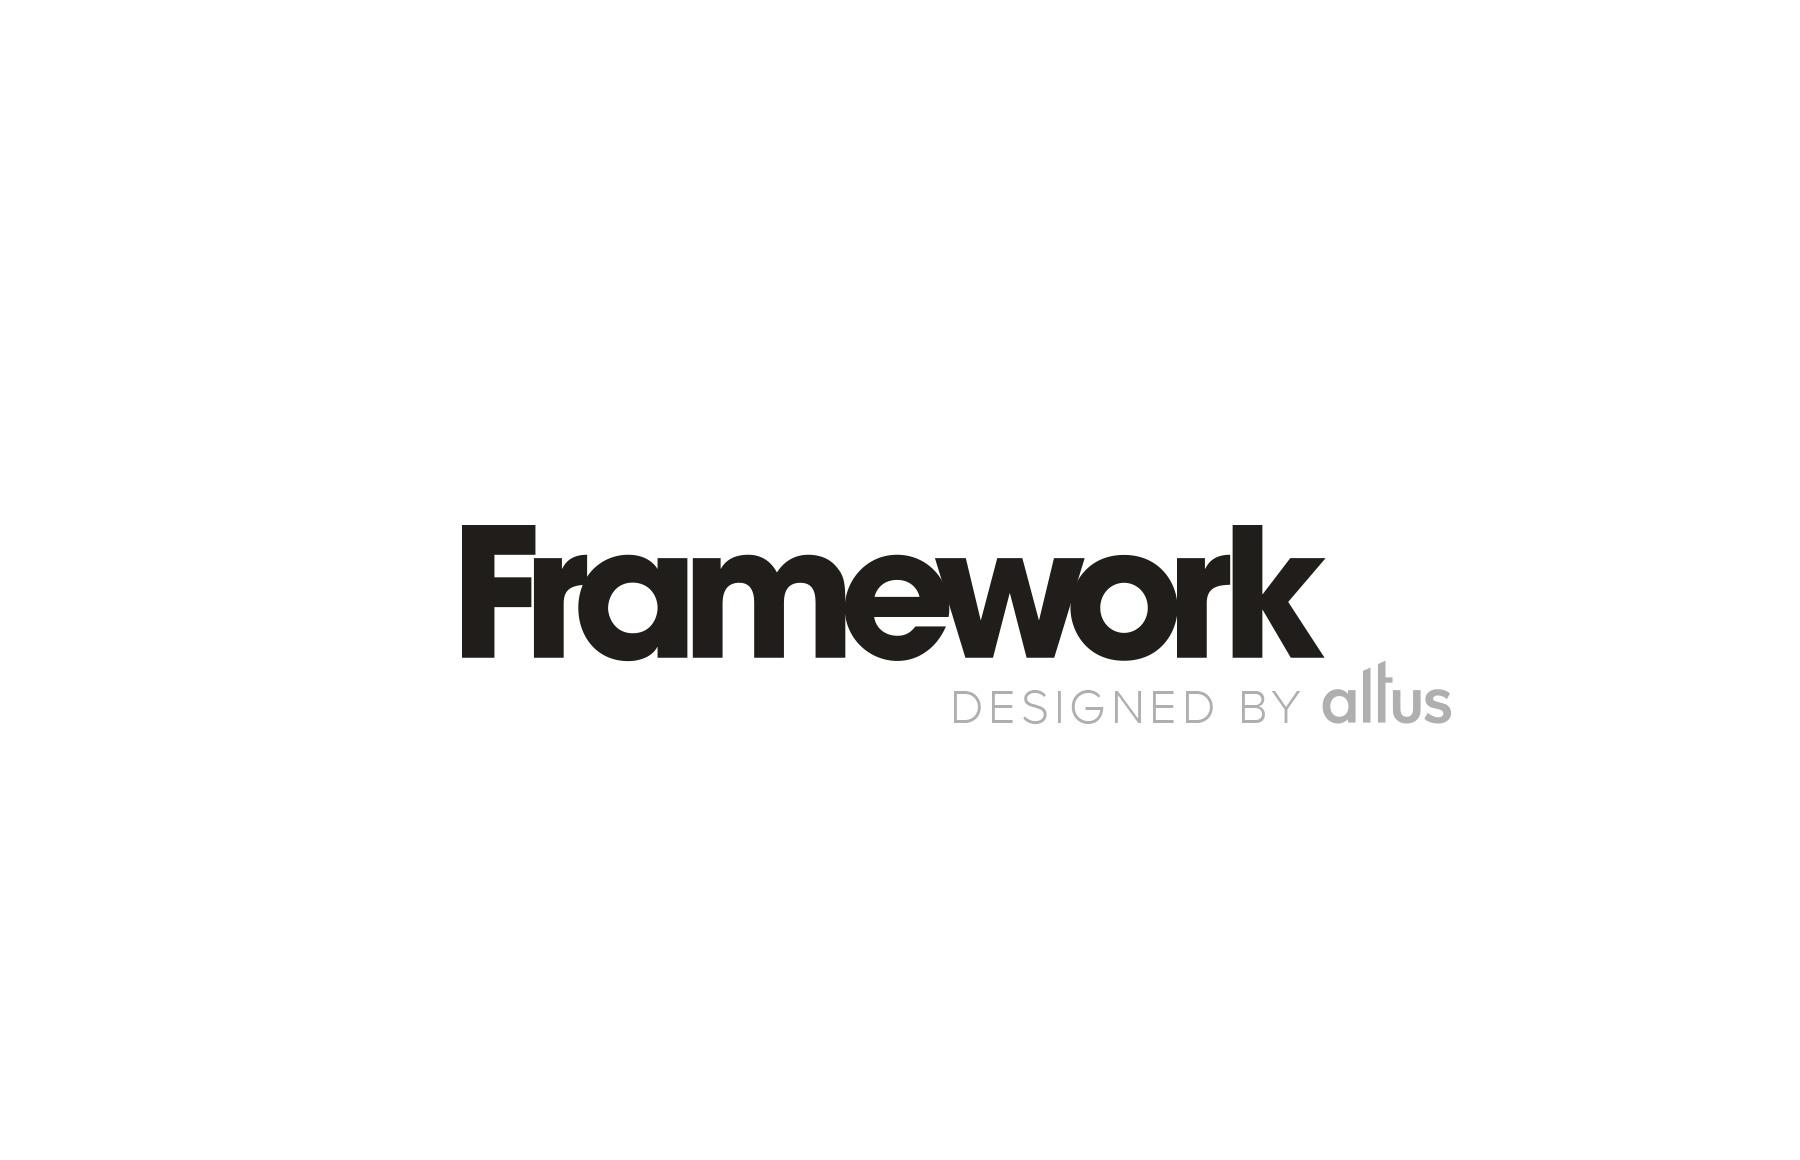 berman_brand_group_joshua_berman_brand_identity_logo_framework_altus.jpg